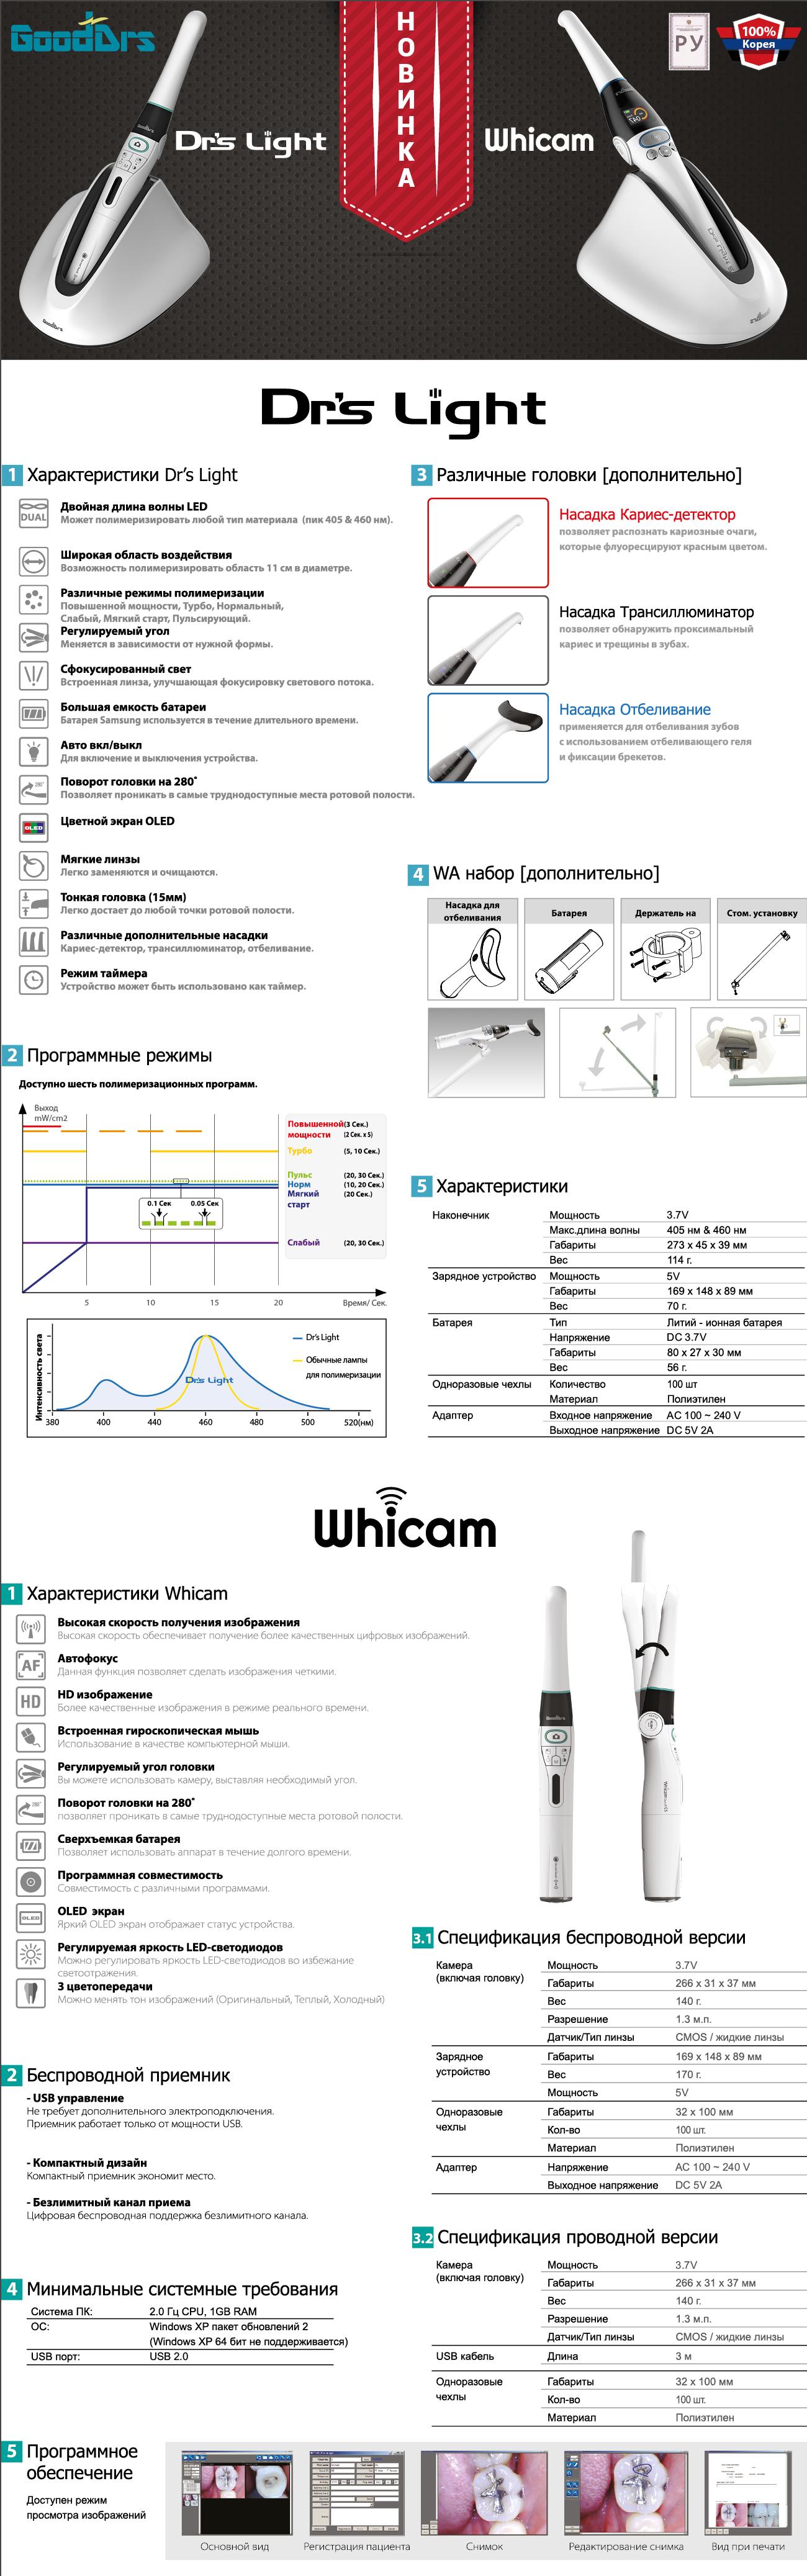 Презентация Drs Light и Whicam для выставки - Компания Good Drs